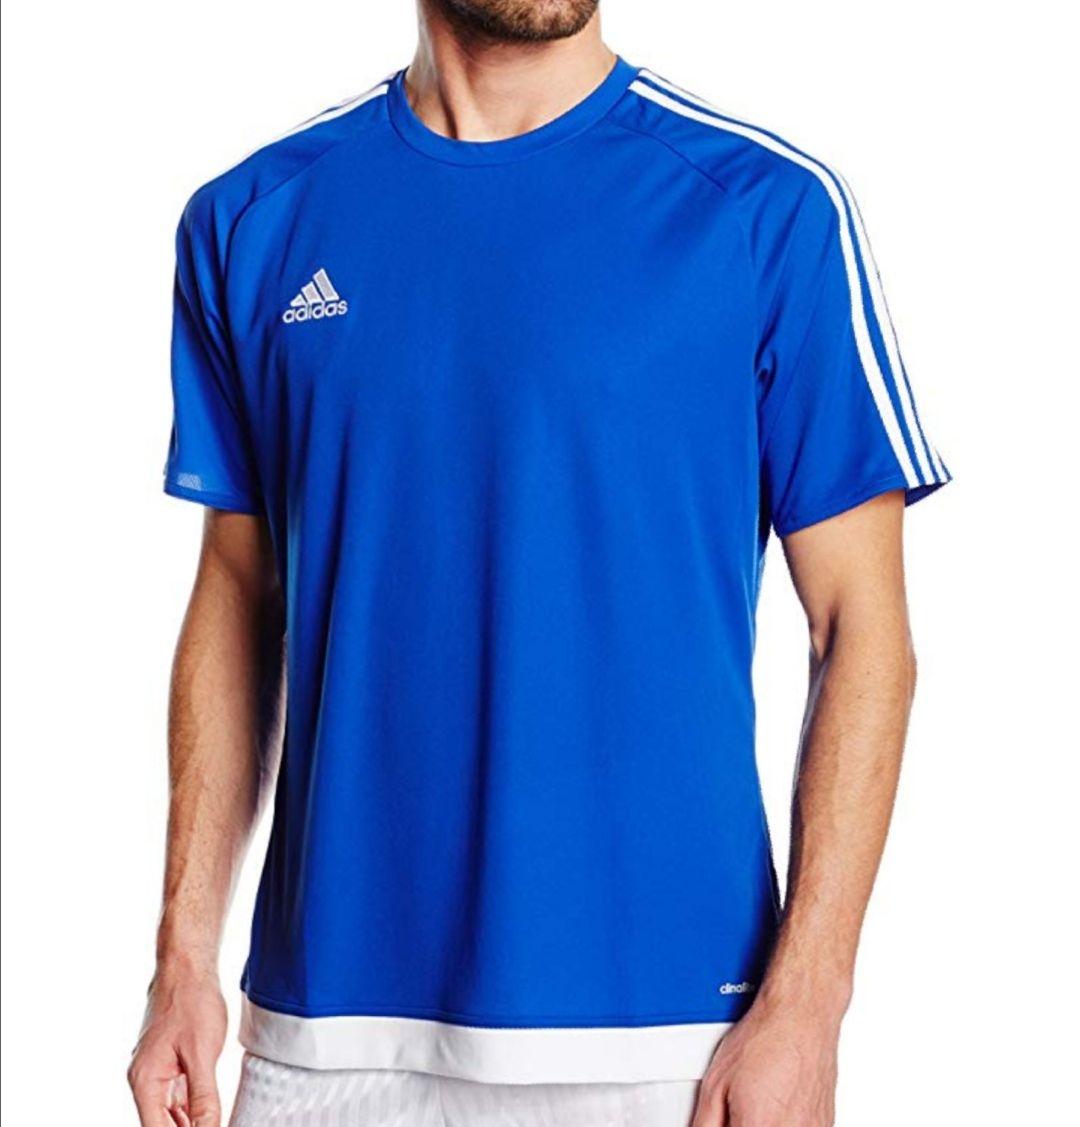 Adidas. Camiseta hombre